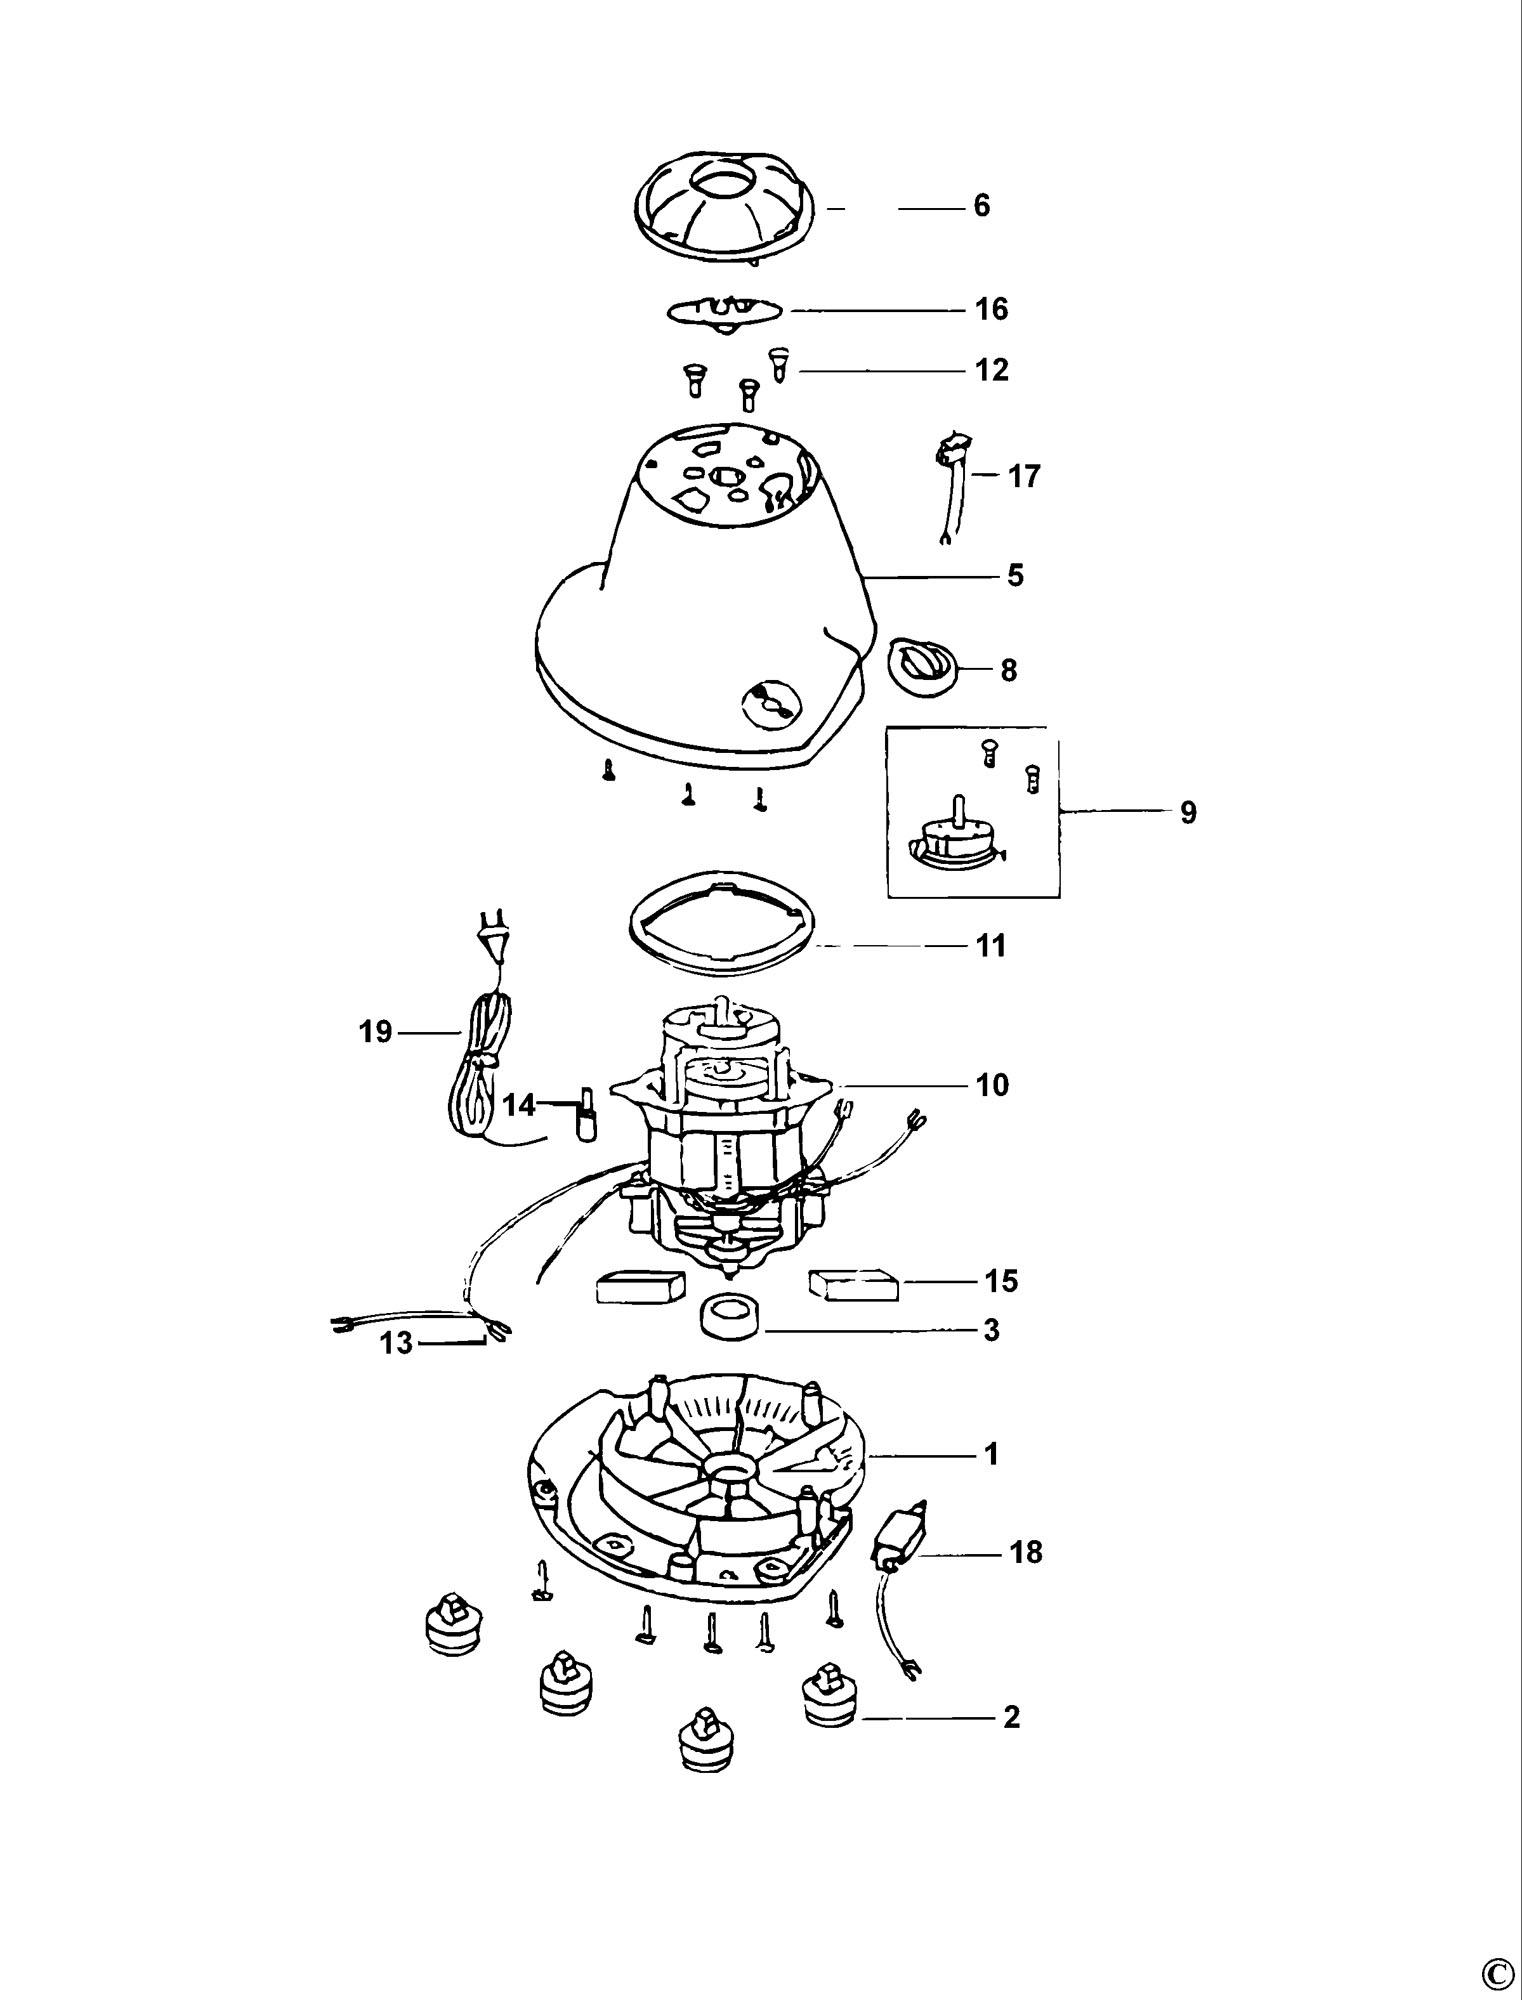 Spares for Black & Decker Mg560 Mixer Grinder (type 1